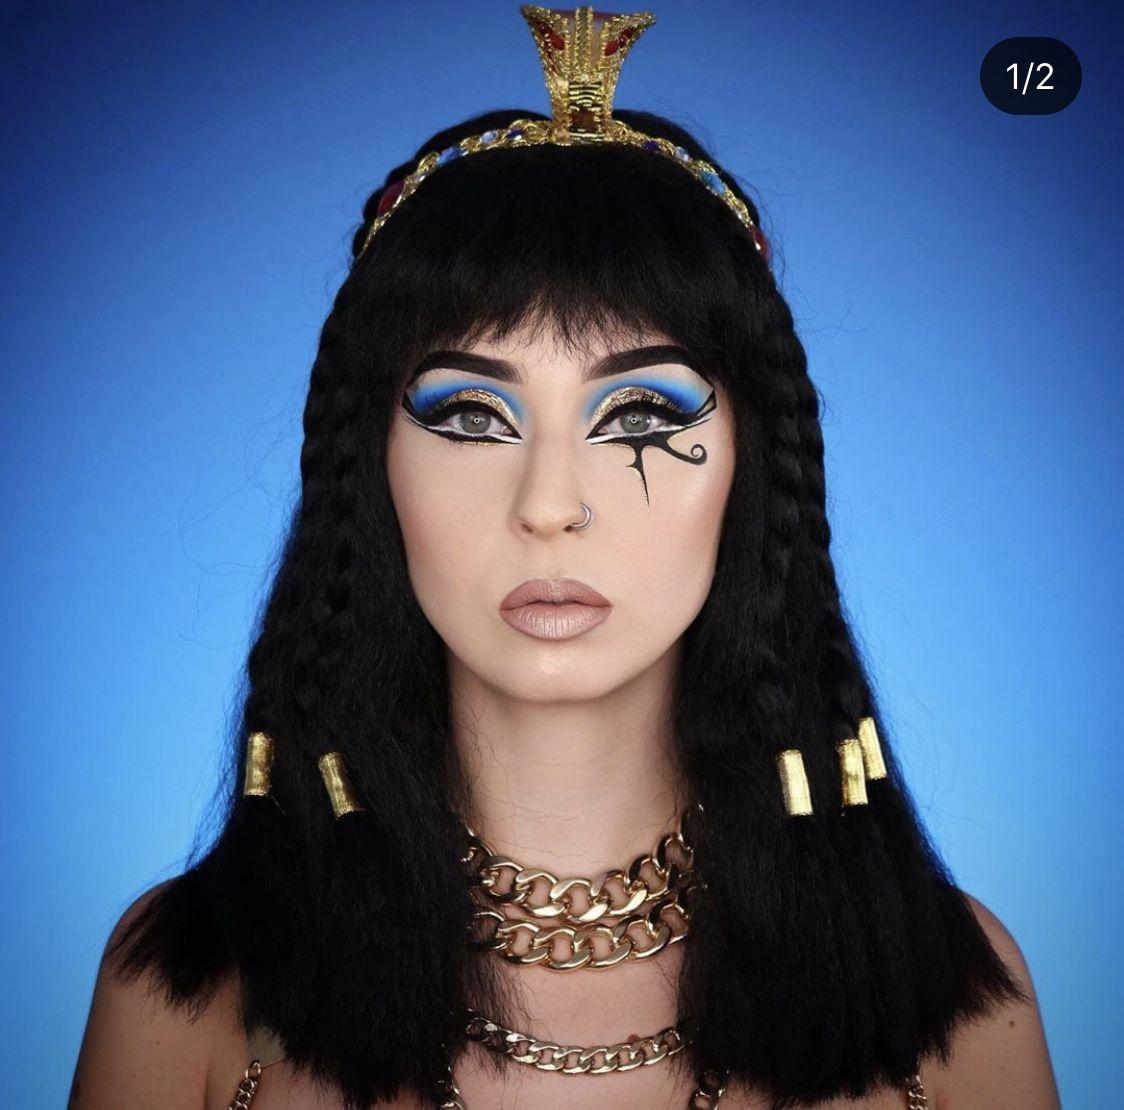 10 HALLOWEEN MAKEUP IDEAS FOR 2019 Halloween makeup